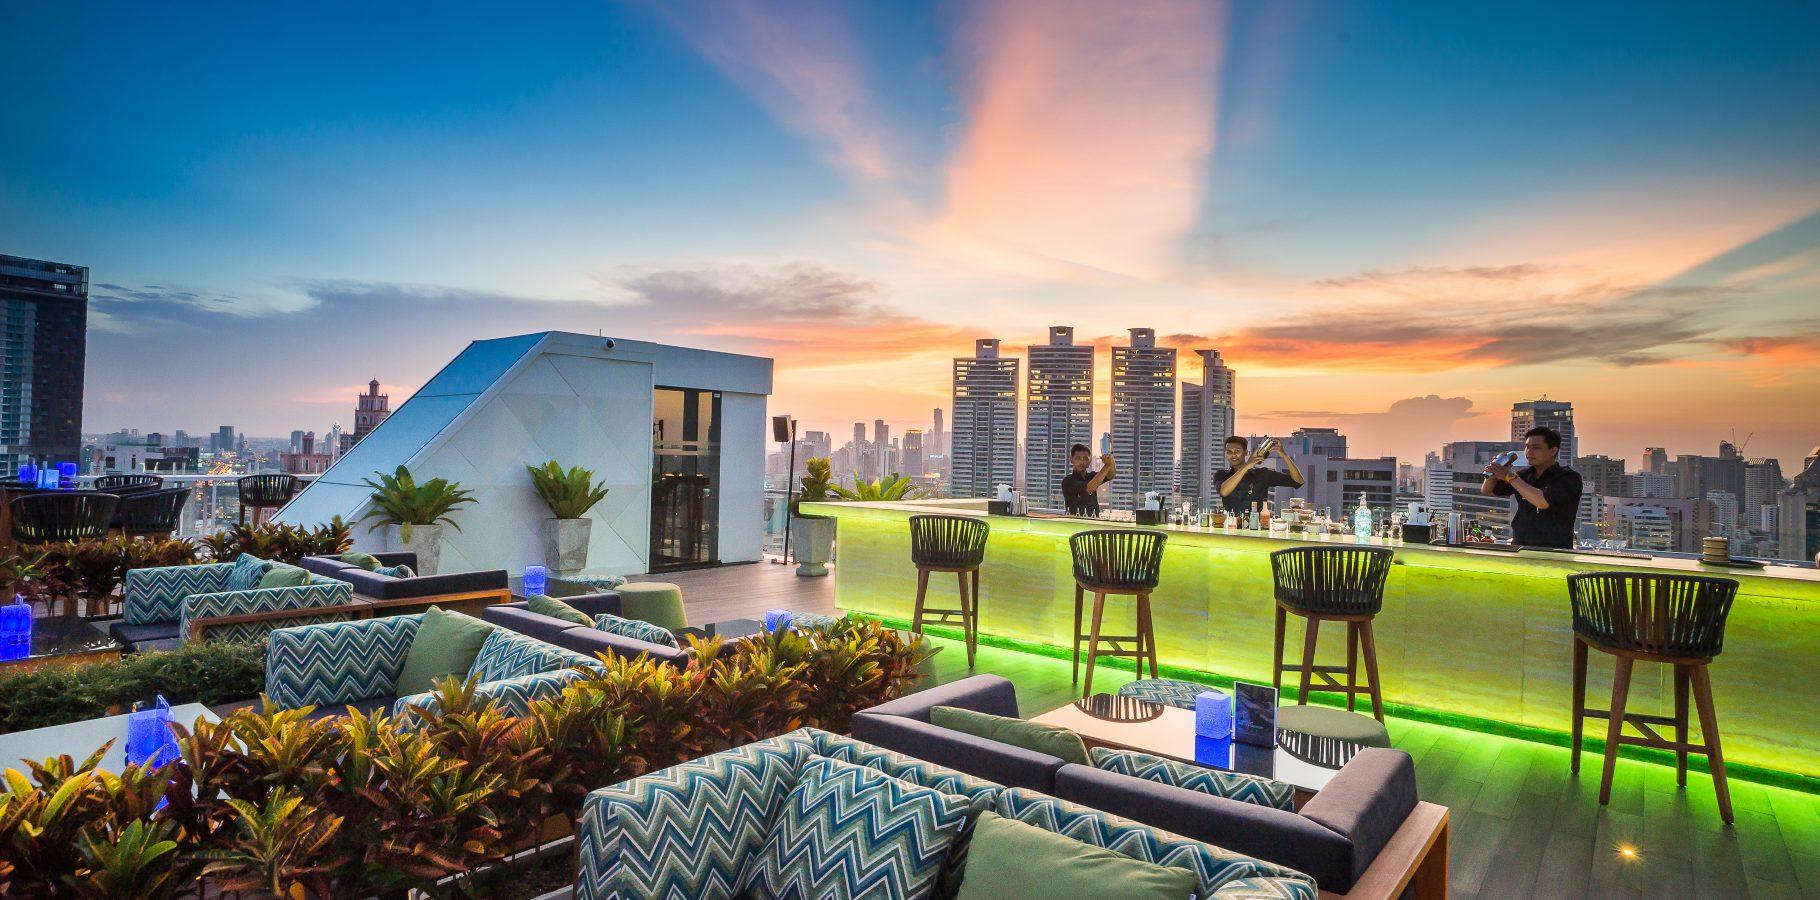 Best Skybars In Bangkok 2019 - The Luxury Editor